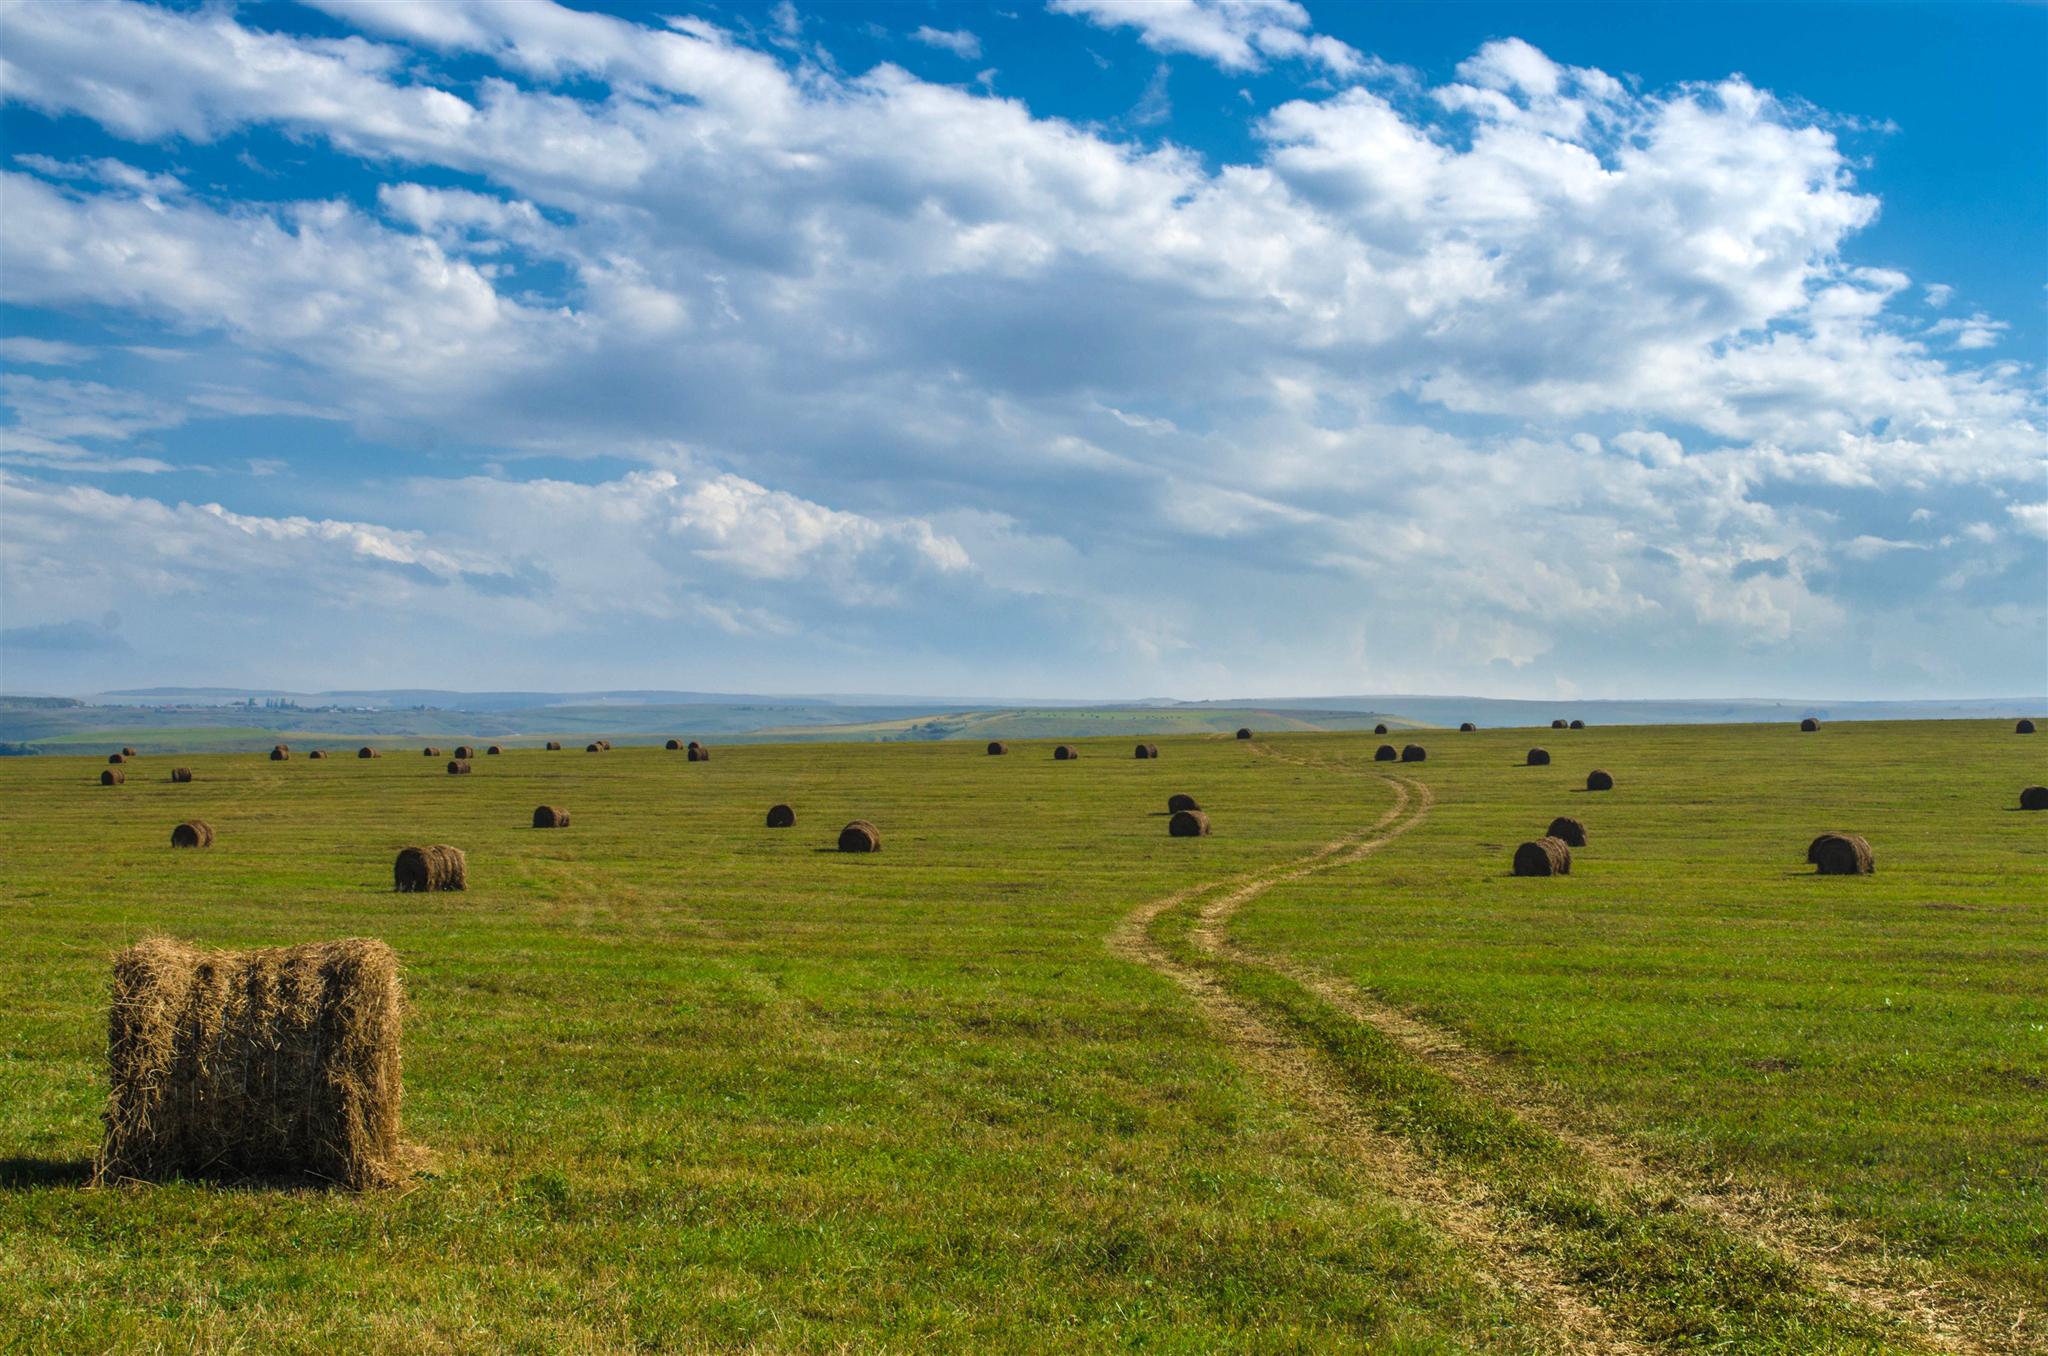 Bales on the plain / 2048 x 1365 / Nature / Photography | MIRIADNA.COM